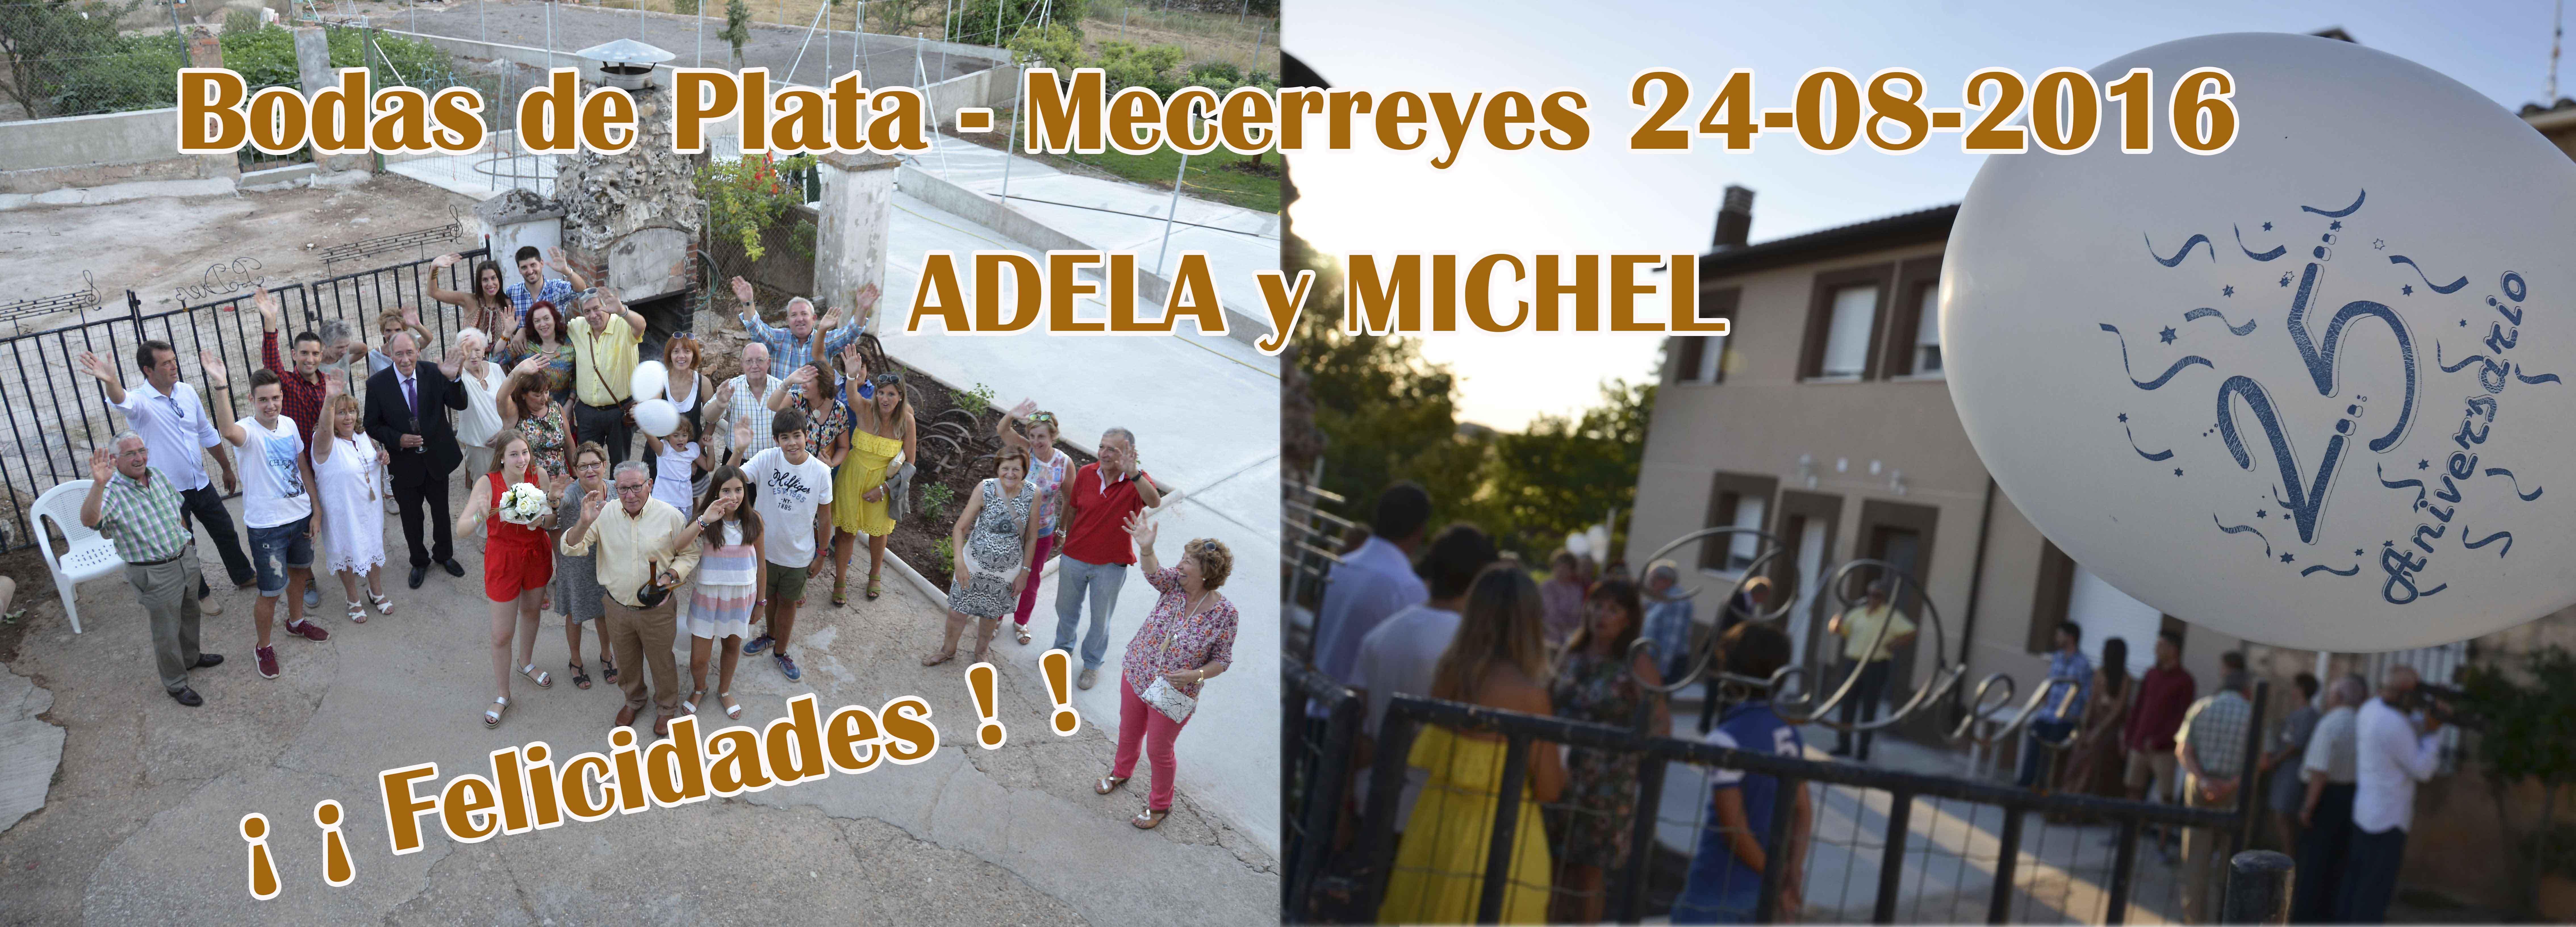 ADELA-MICHEL-2 -Bodas de plata 24-08-16, Mecerreyes